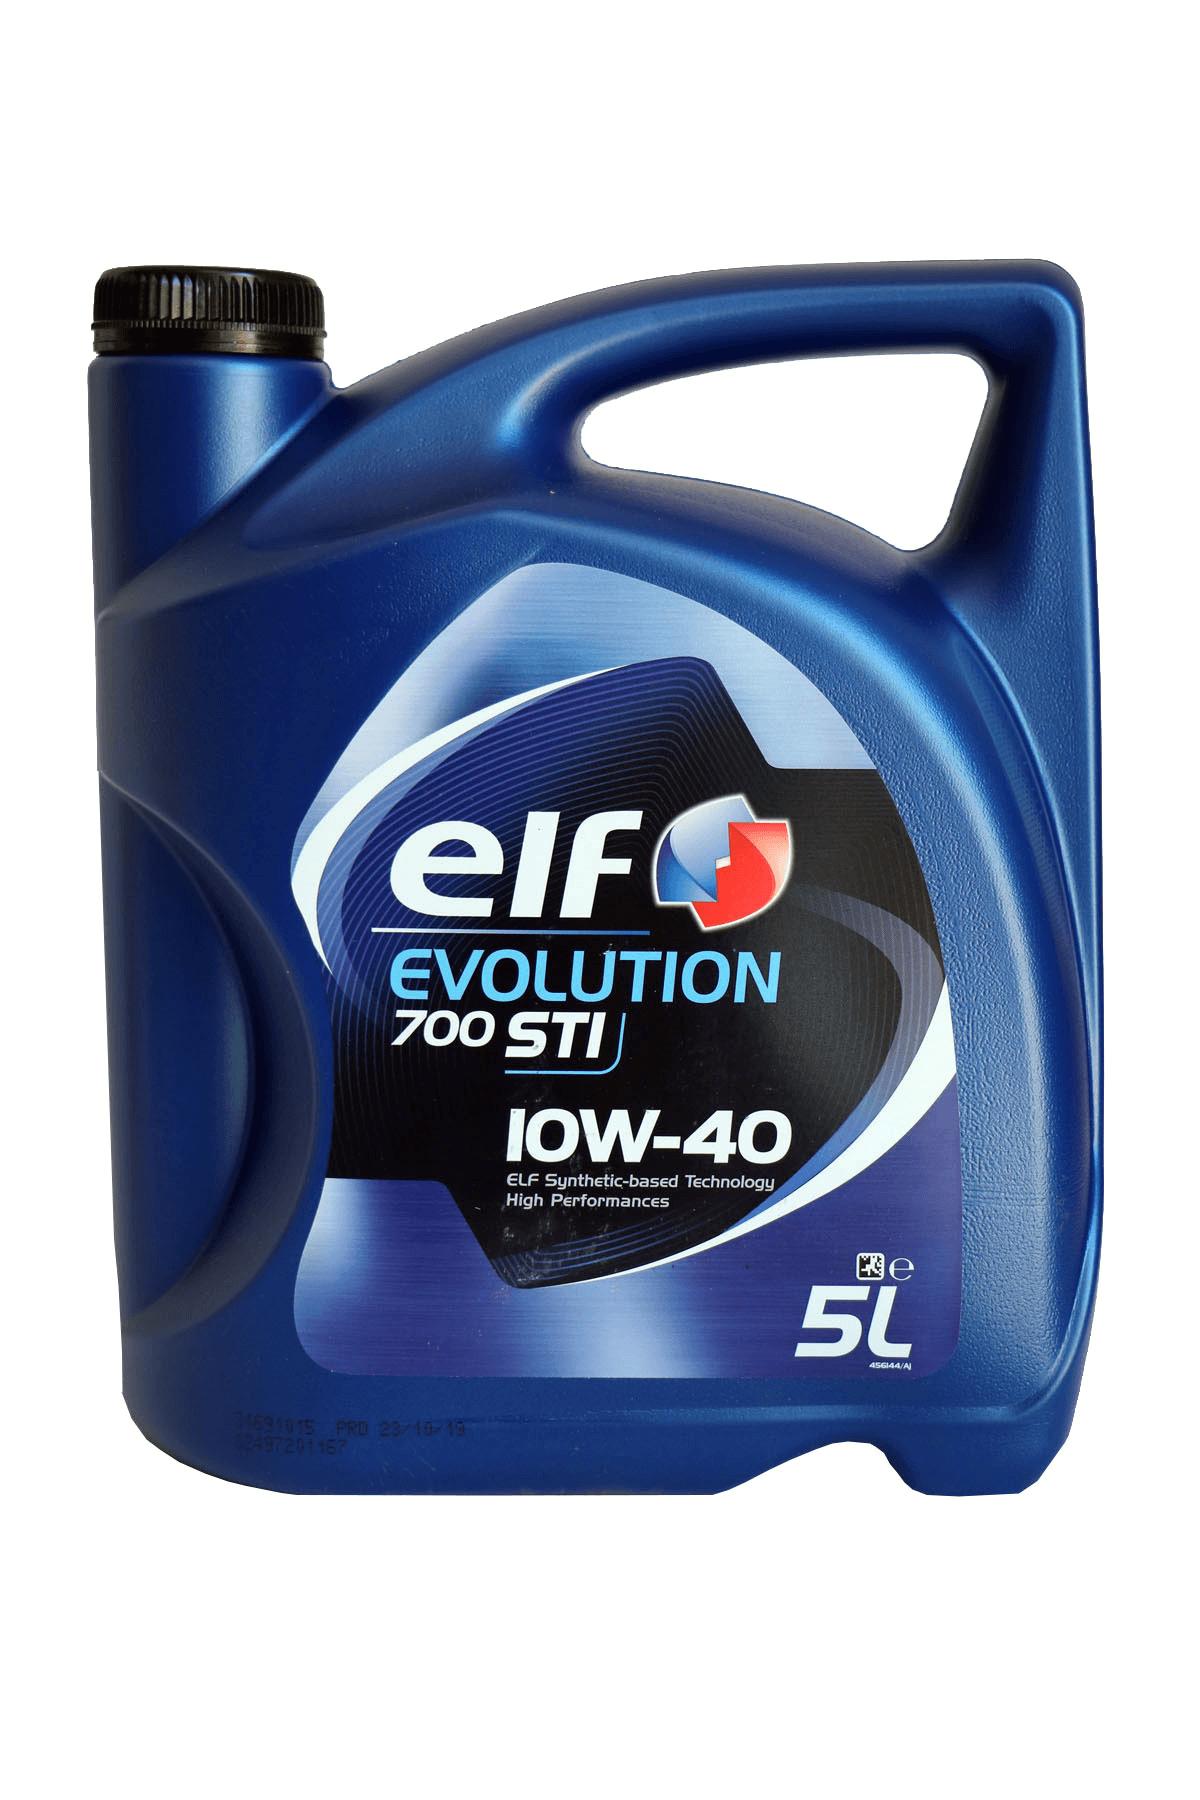 ELF Evolution 700 STI 10W-40 Motoröl, 5l